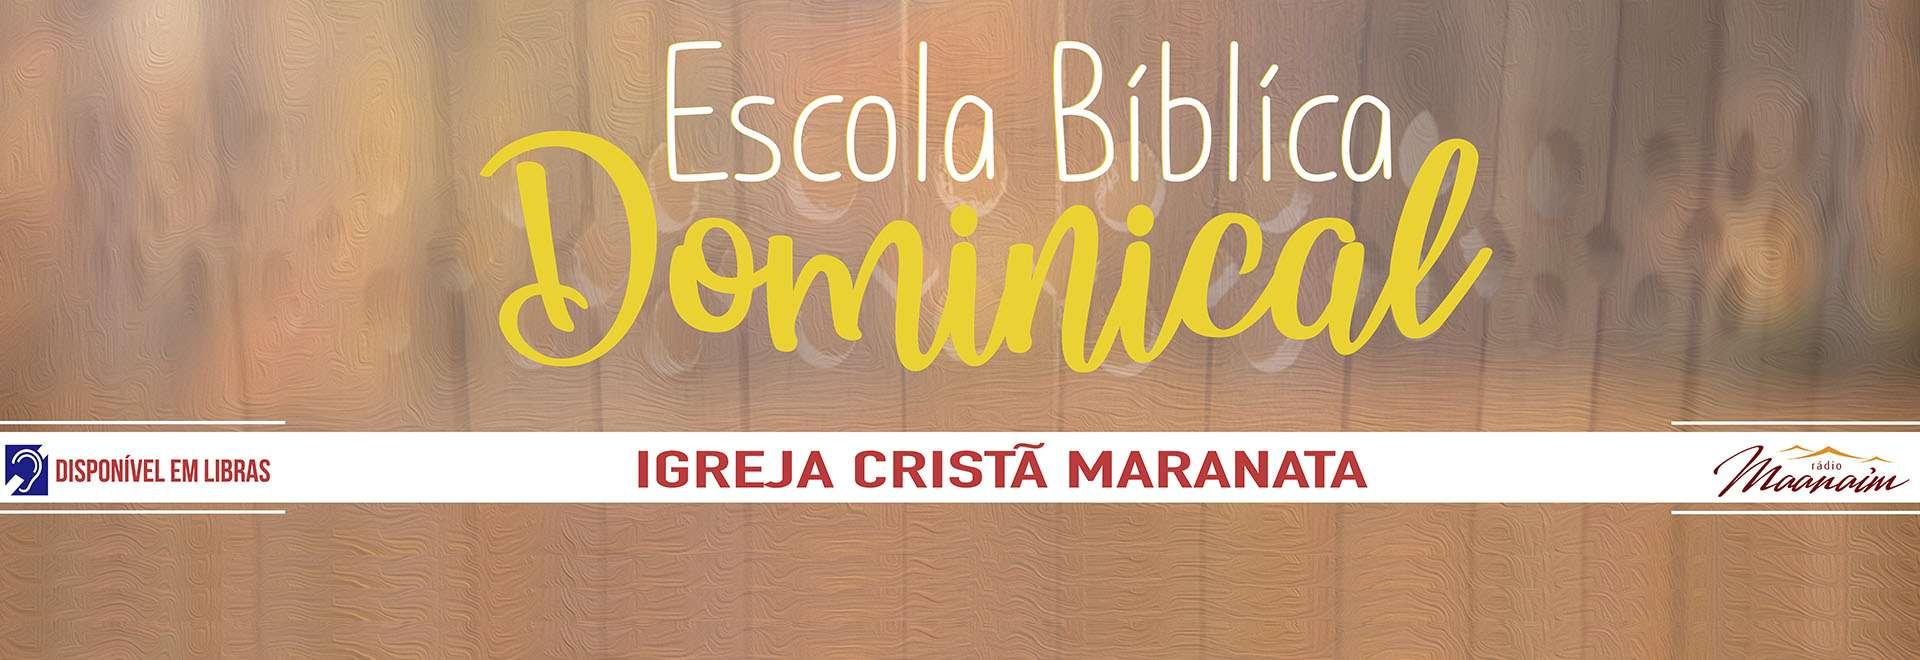 Participações da EBD da Igreja Cristã Maranata - 04/04/2021